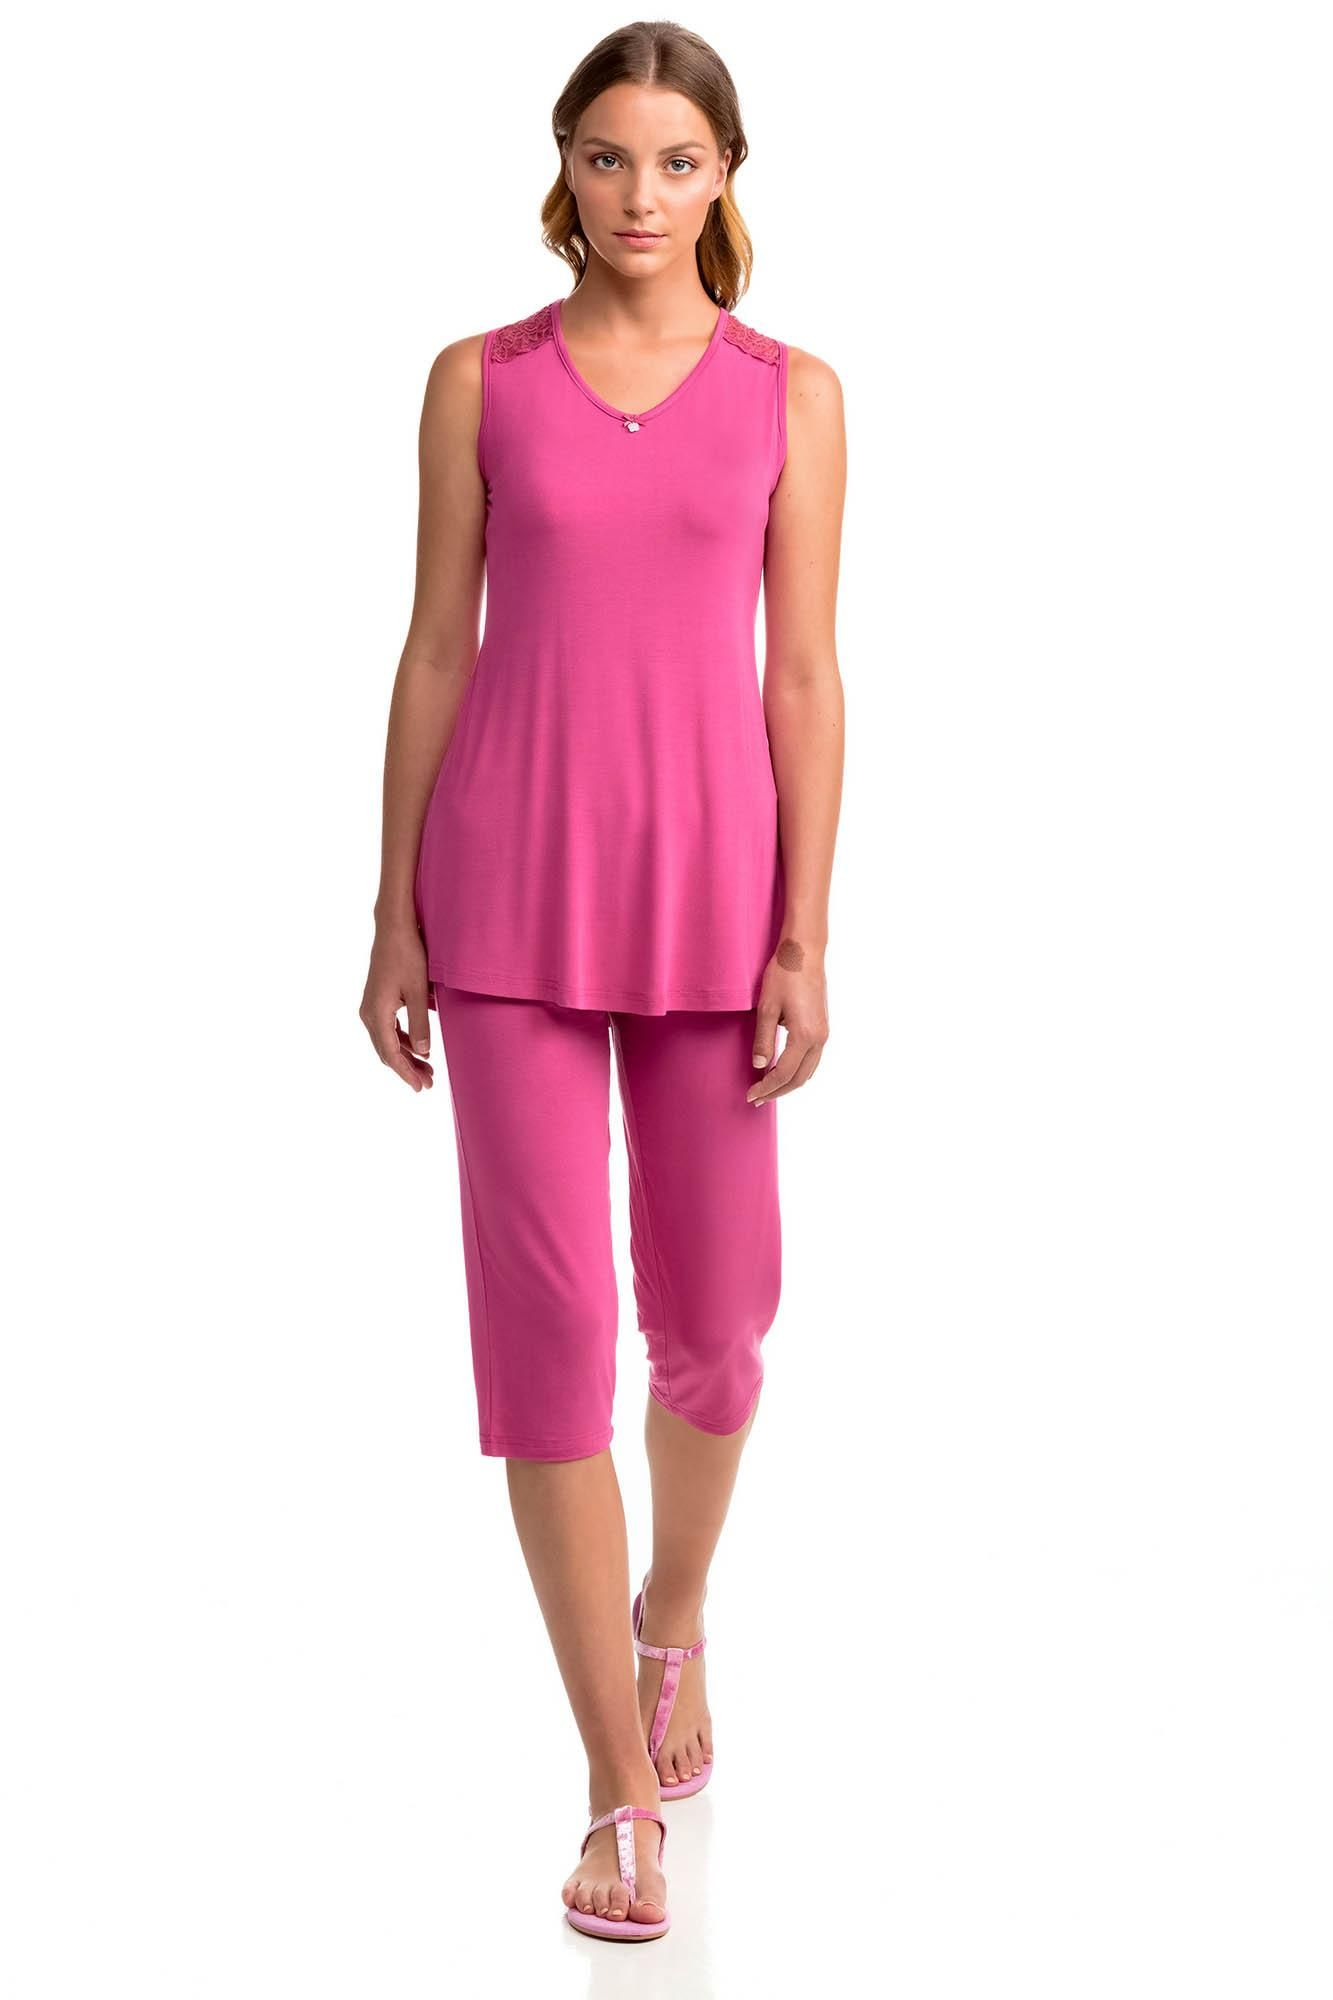 Women's Top and Capri Pants Homewear